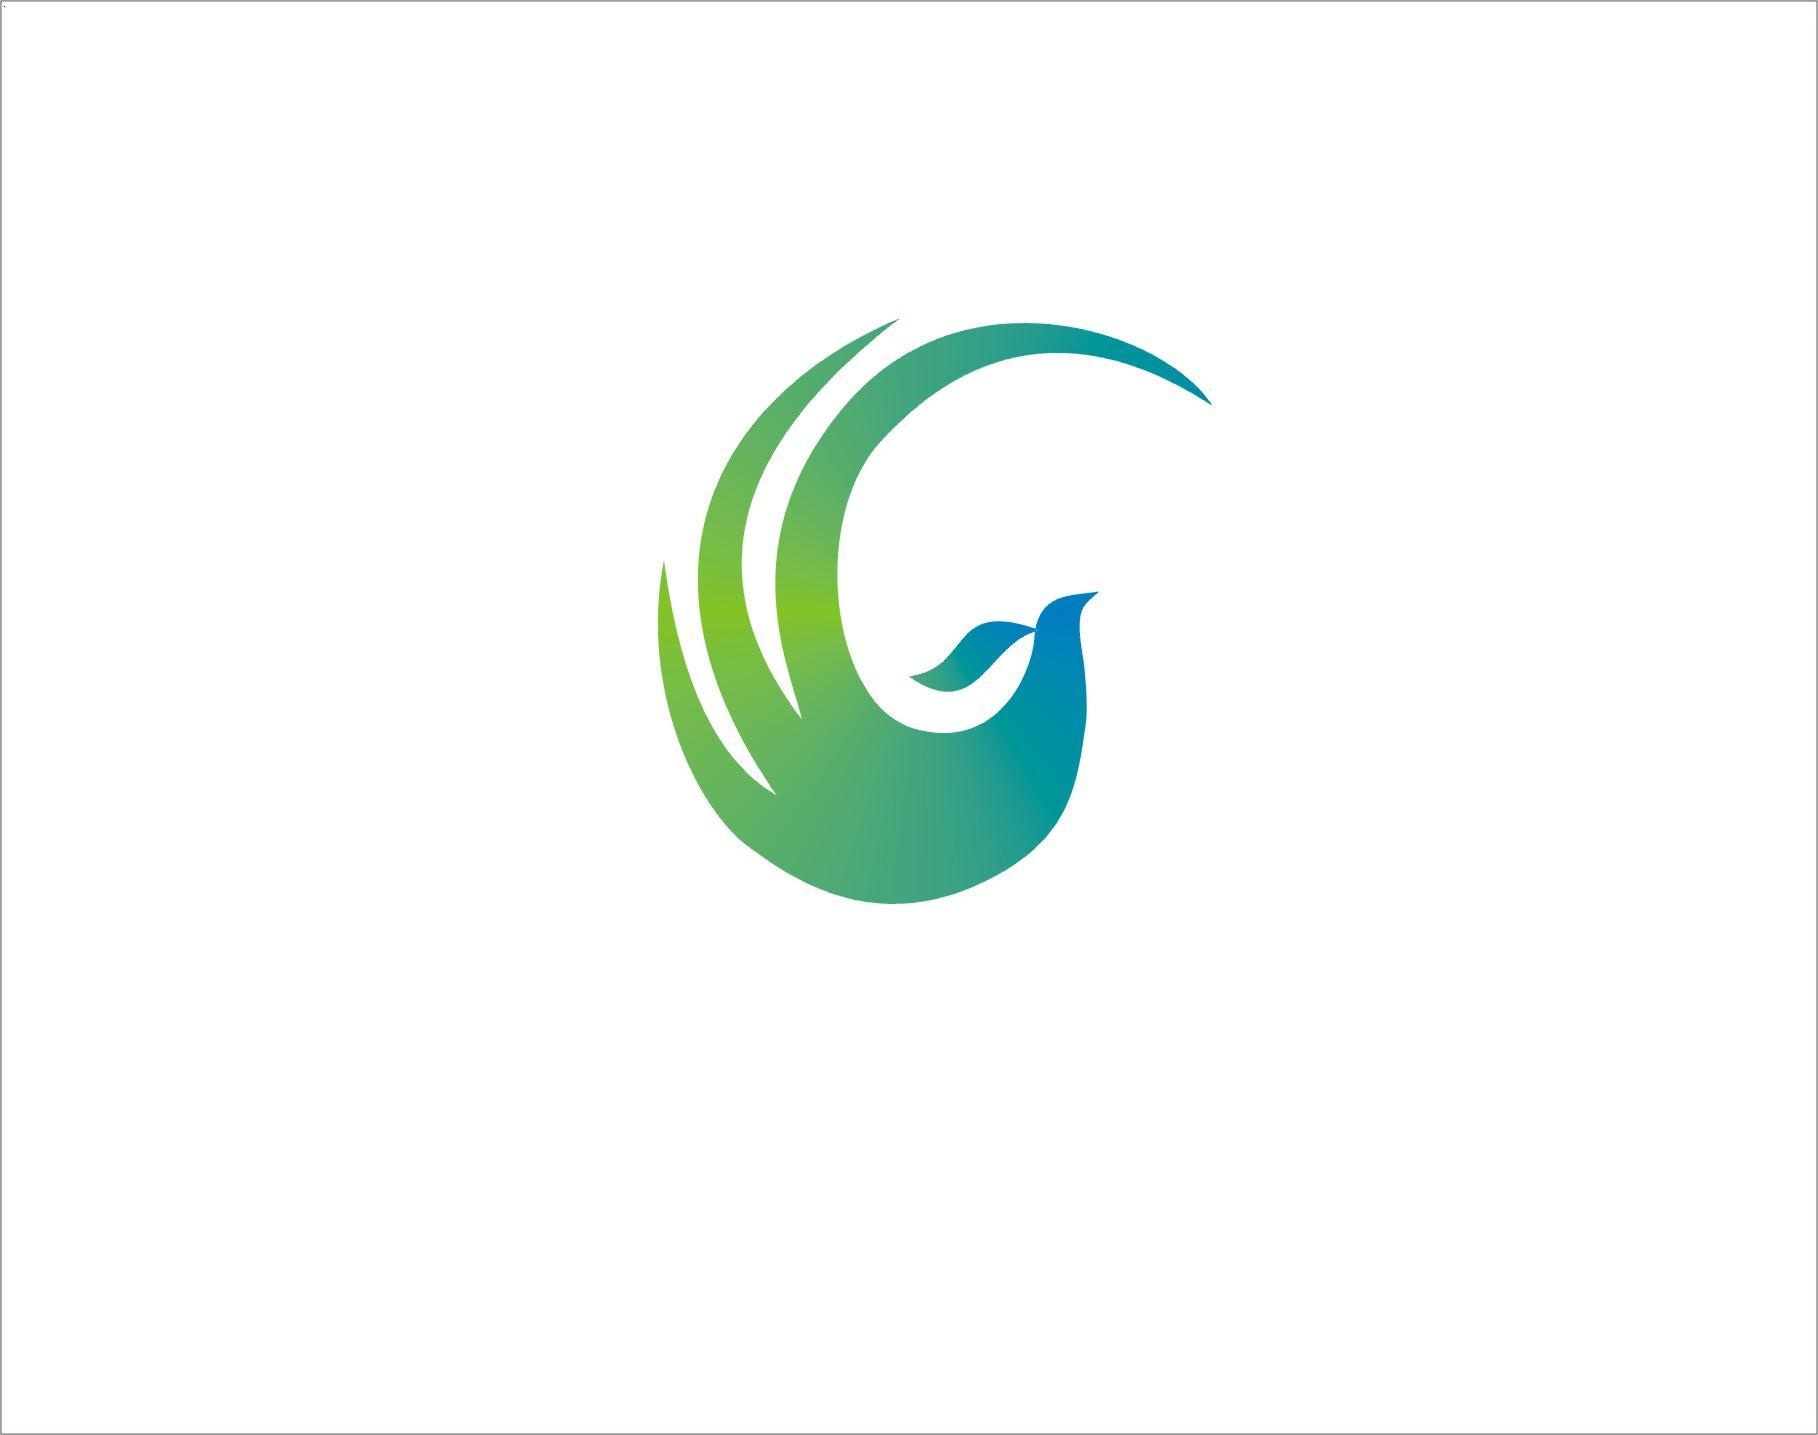 logo logo 标志 设计 图标 1818_1435